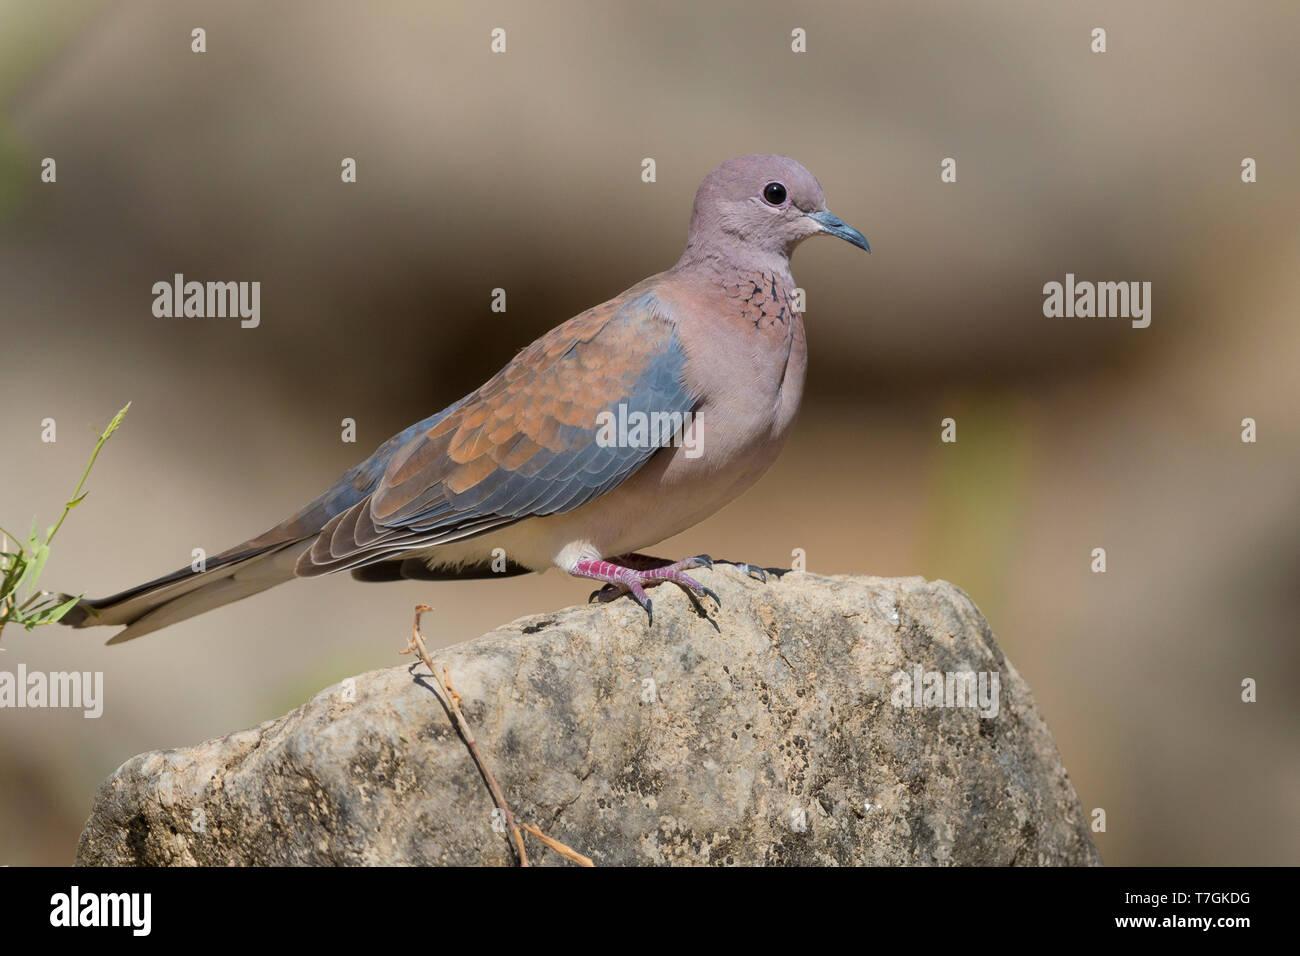 Laughing Dove (Streptopelia senegalensis), adult perched on a rock, Wadi Darbat, Dhofar, Oman Stock Photo